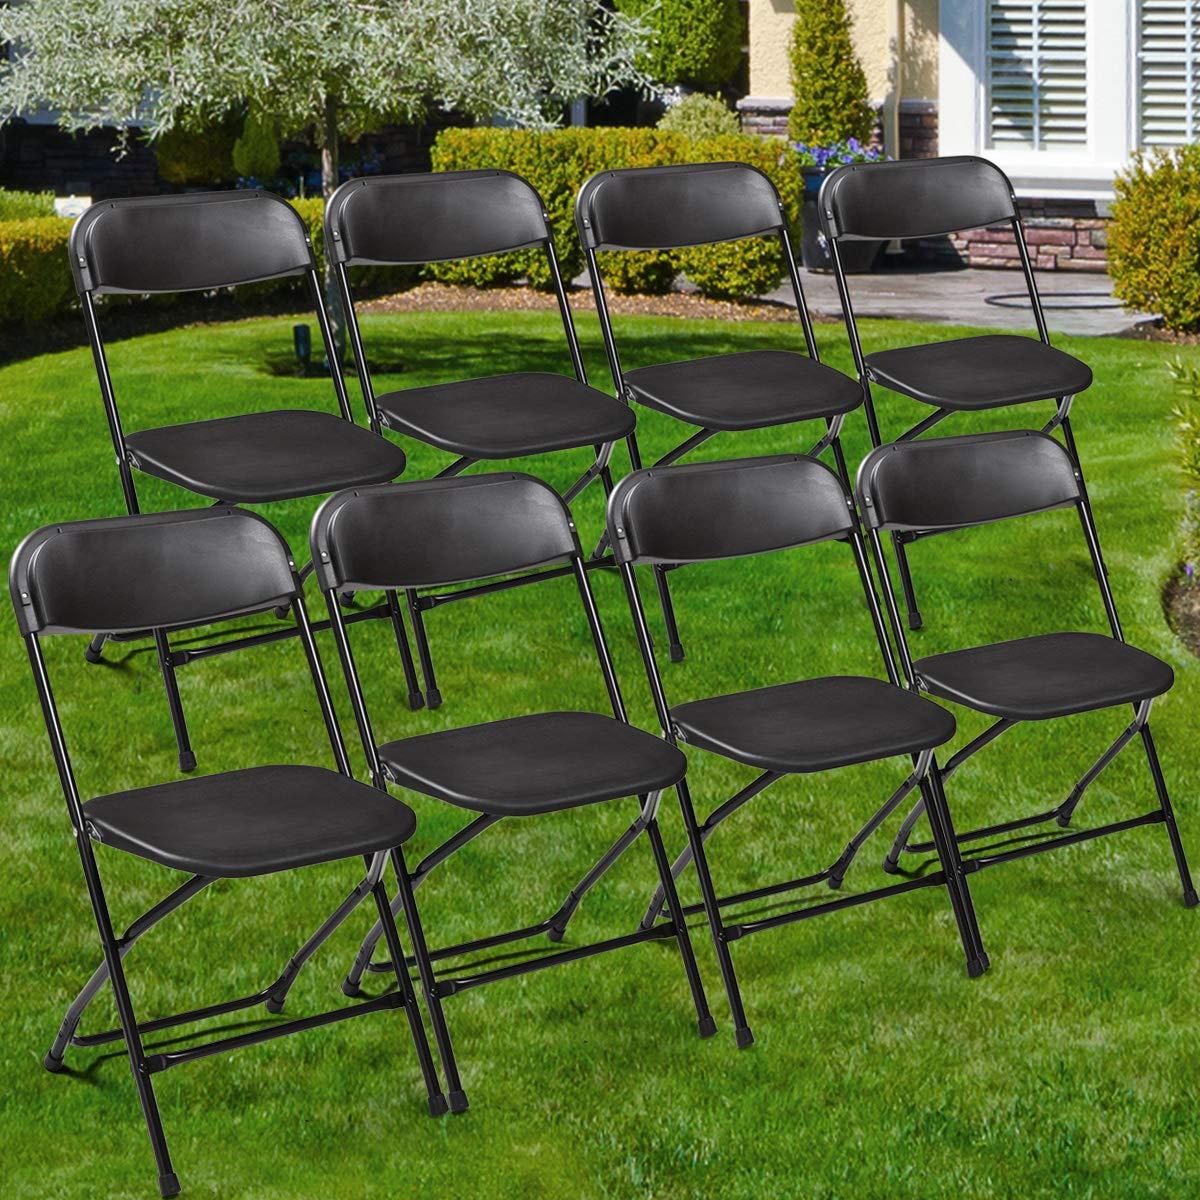 Amazon.com: lazymoon negro silla plegable de plástico PATIO ...